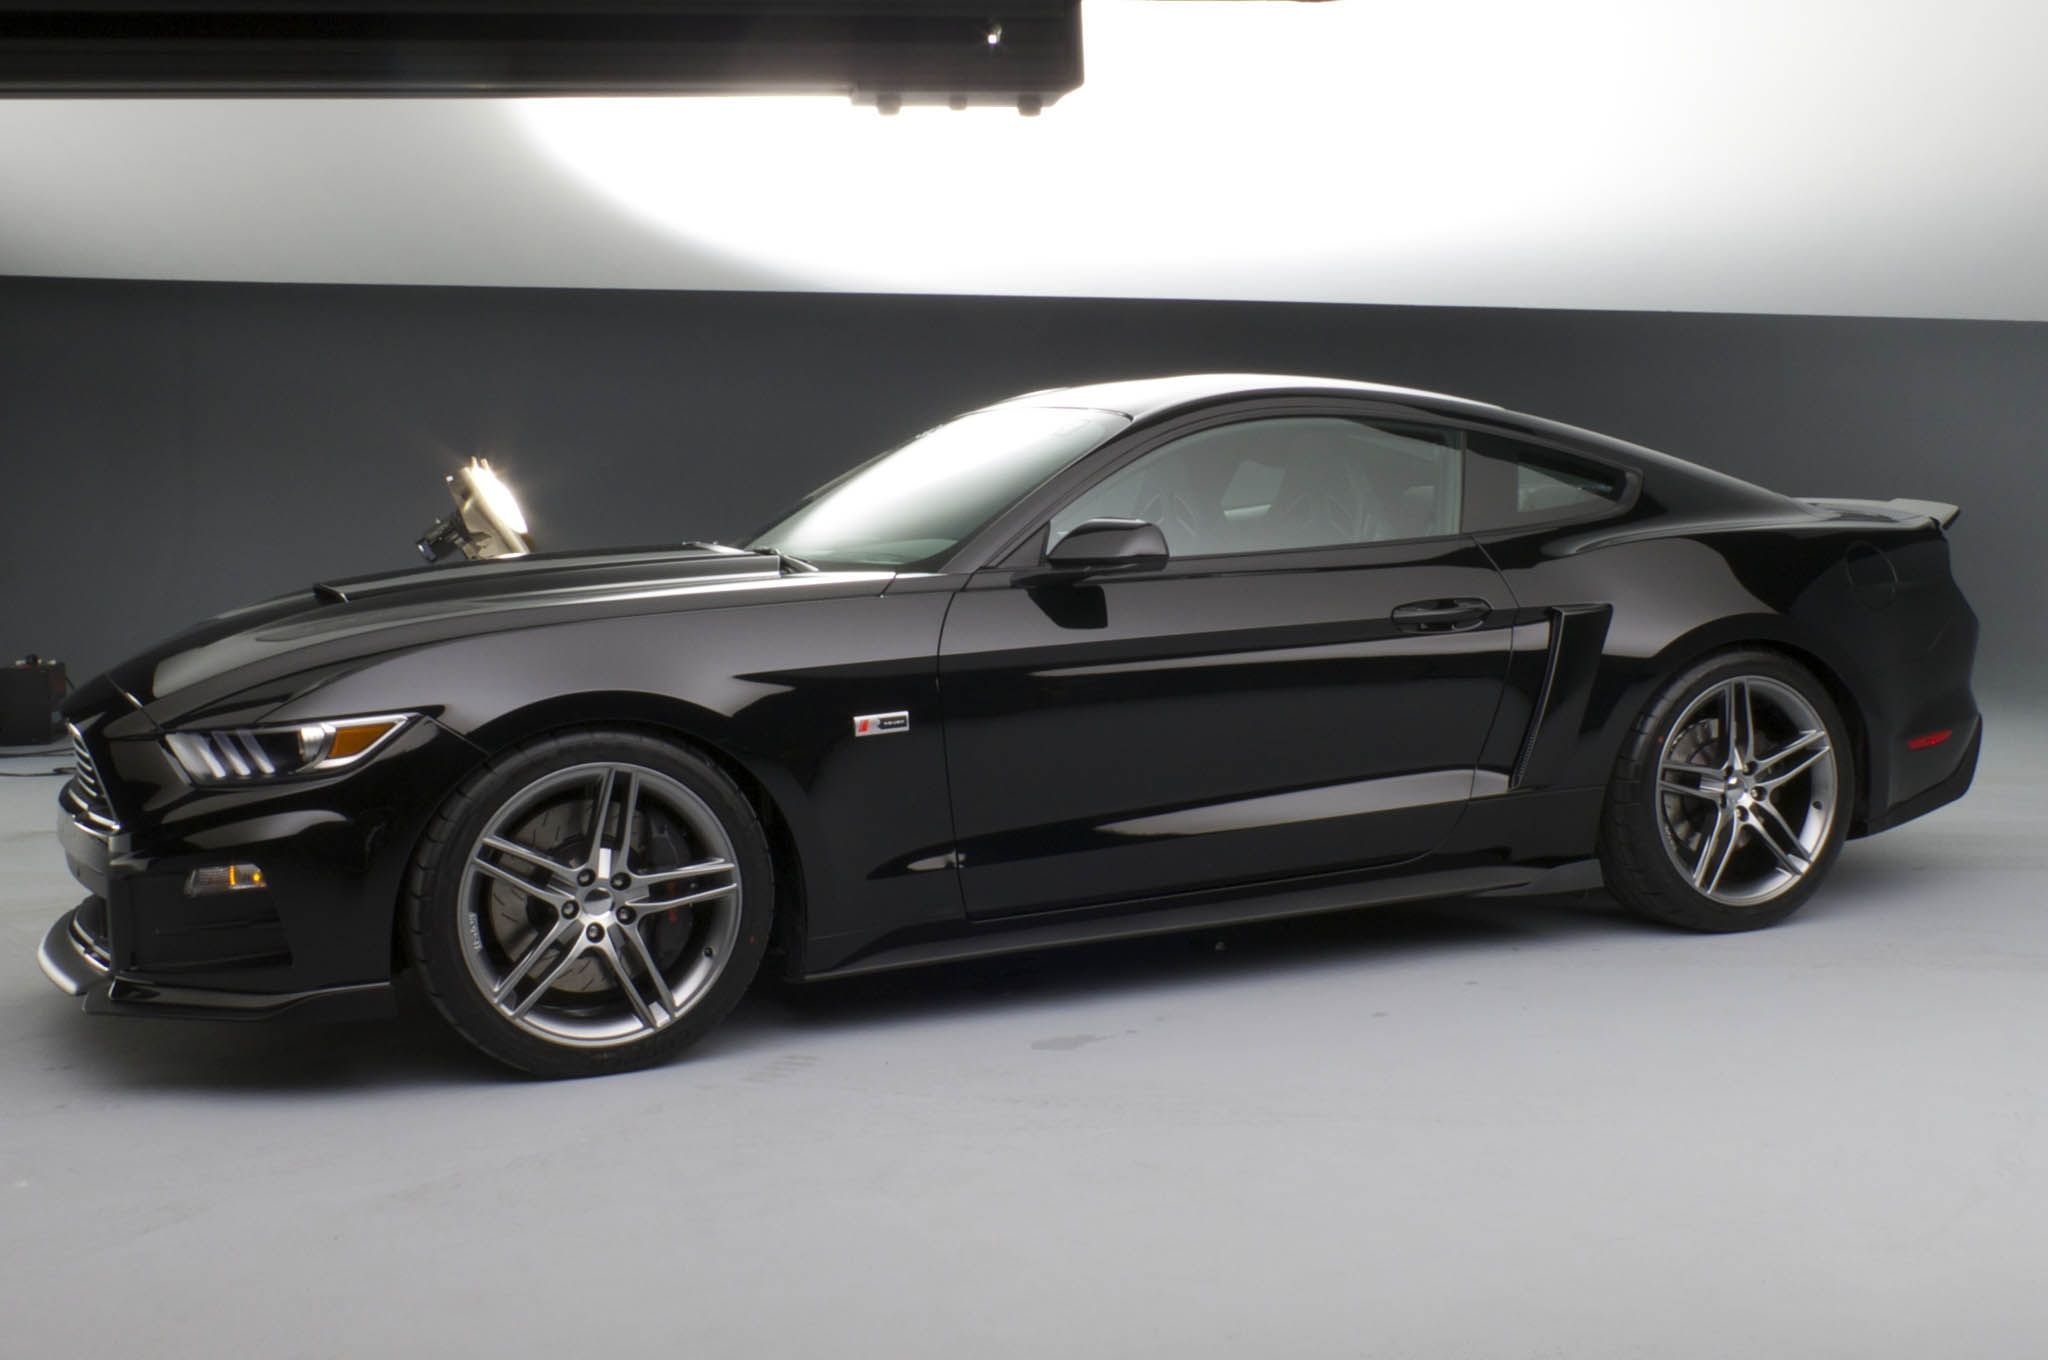 Ford Mustang 2015 High Resolution Wallpaper FordMustang2015 HighResolutionWallpaper